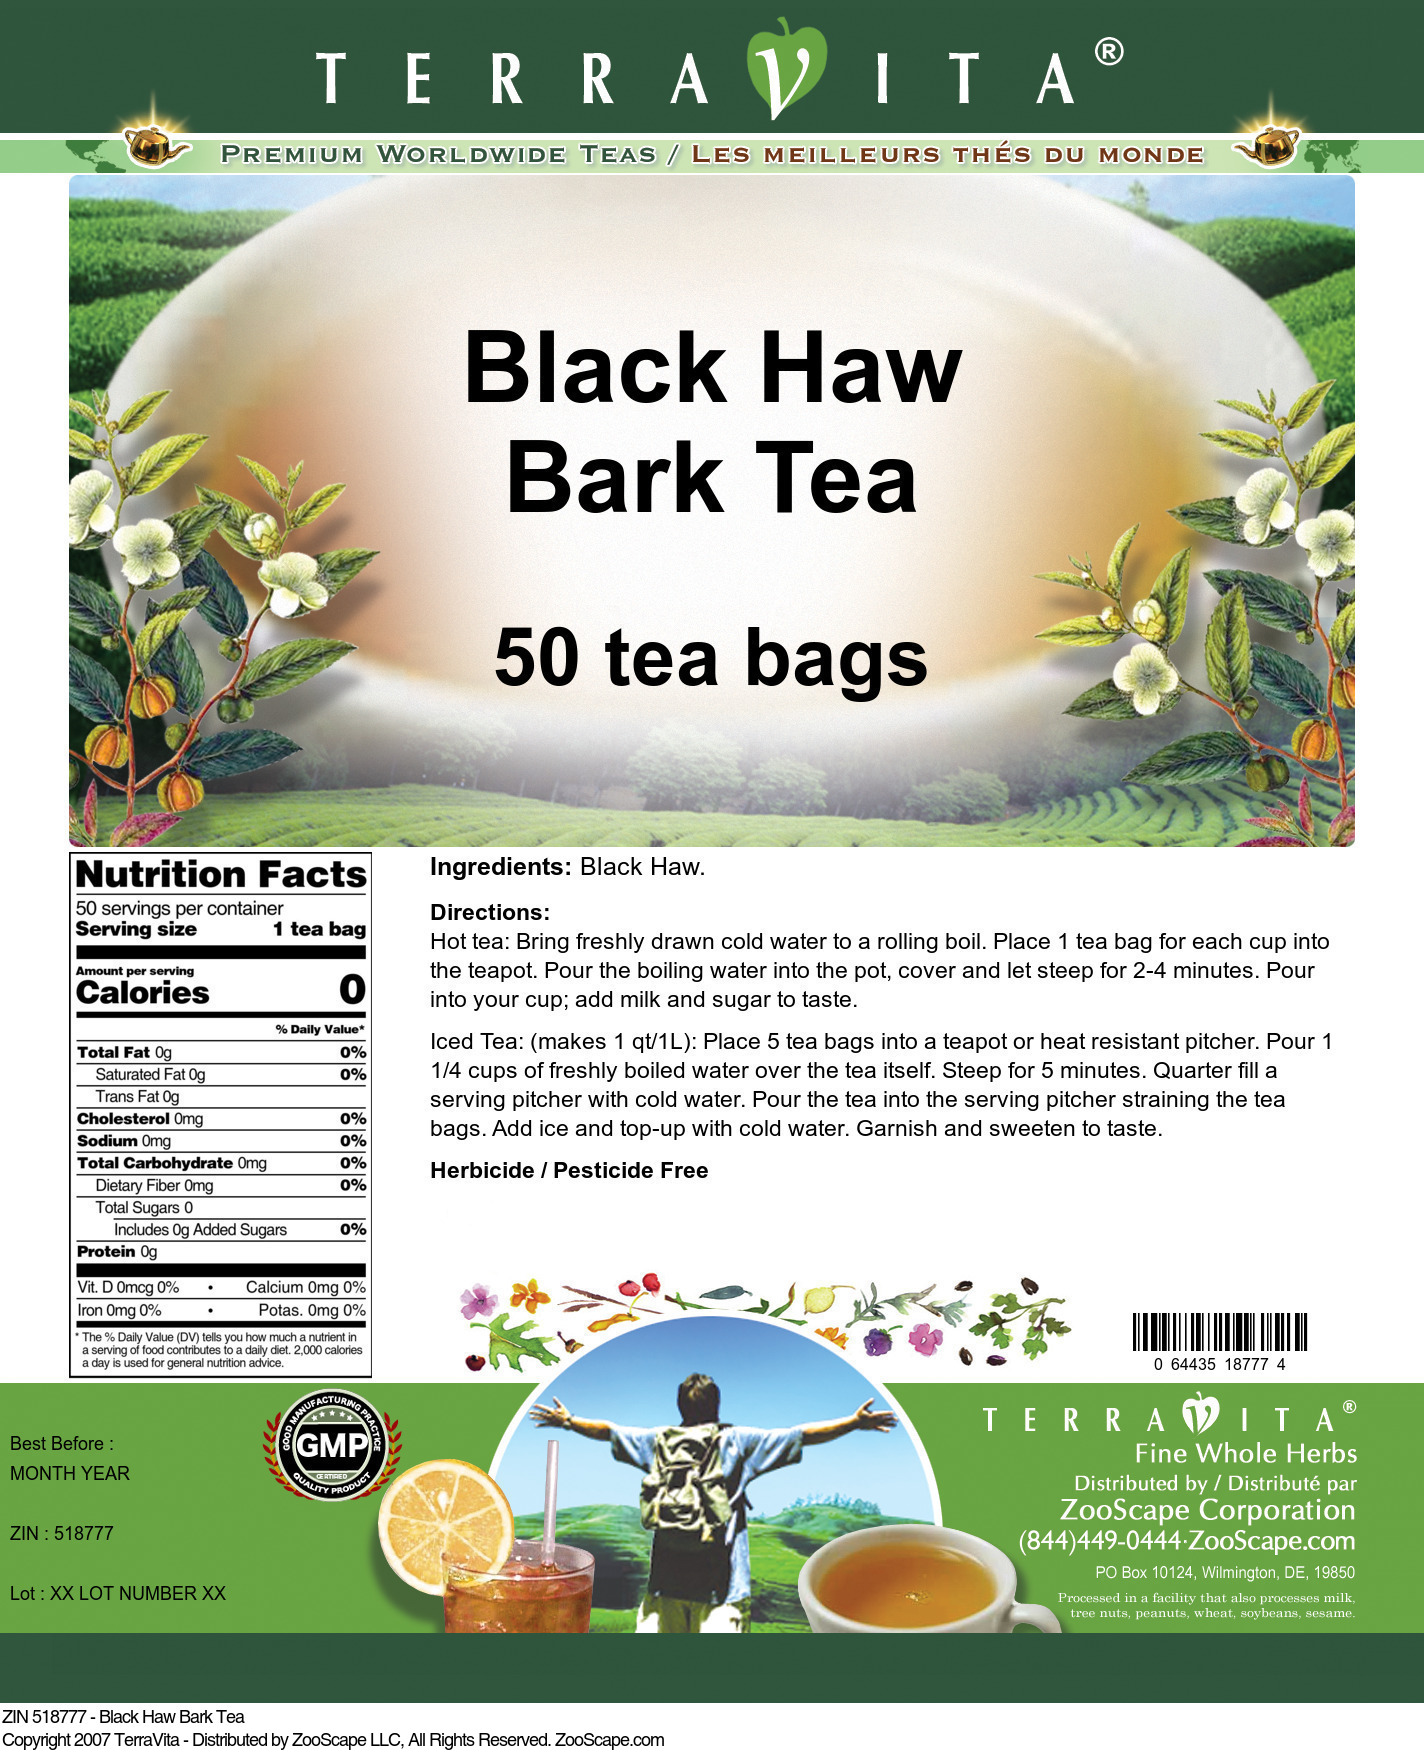 Black Haw Bark Tea